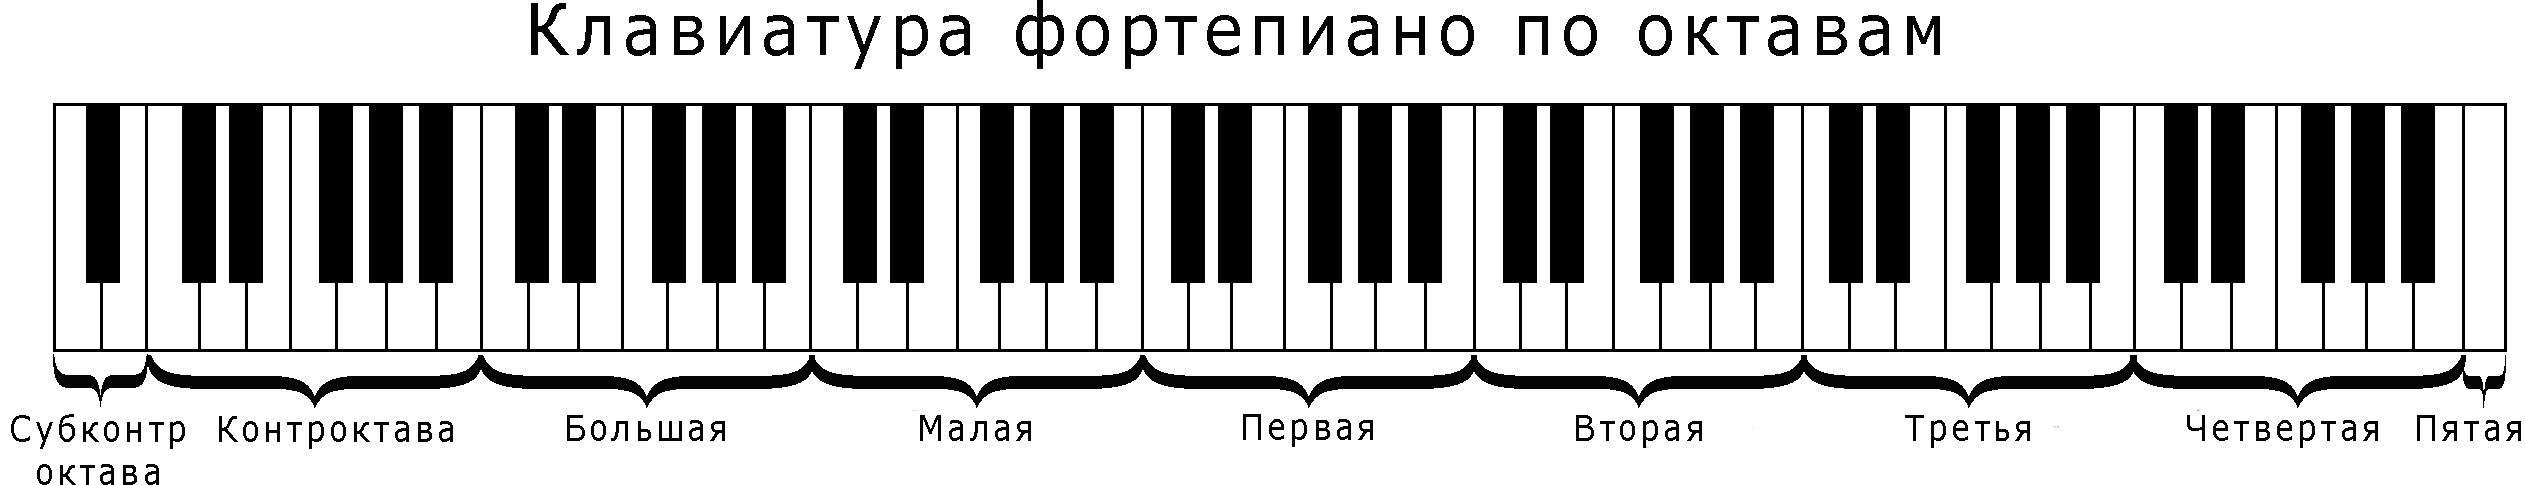 Сколько клавиш у пианино | Все о ...: propiano.ru/skolko-klavish-u-pianino